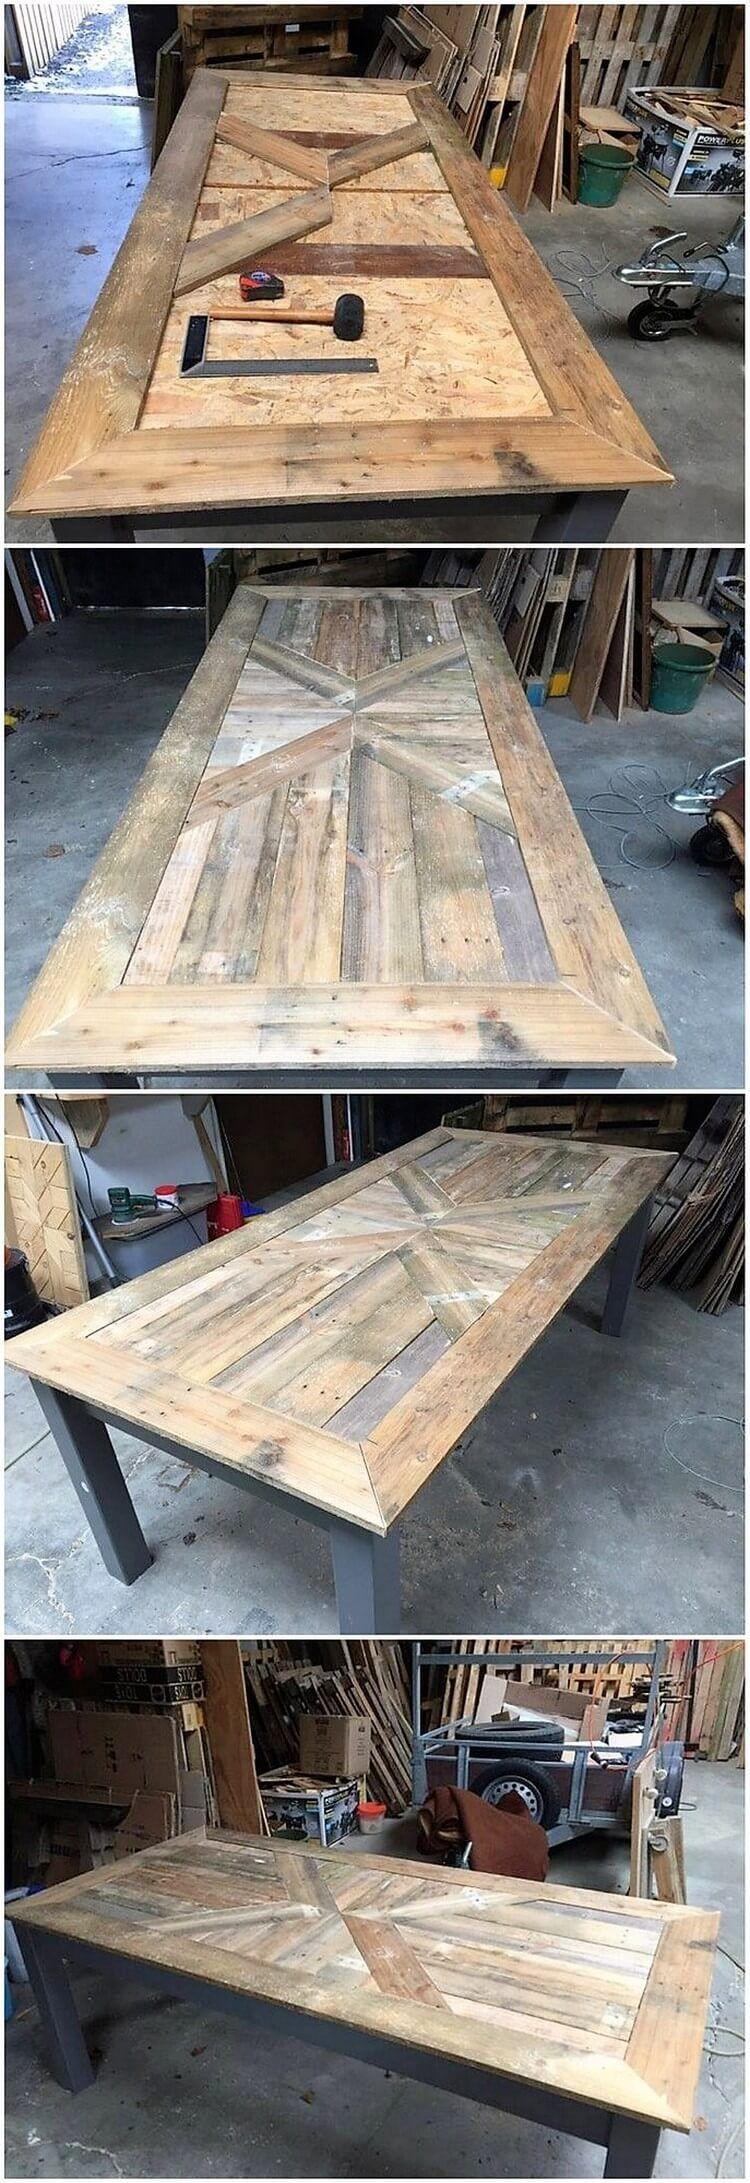 unglaubliche ideen f r upcycling versand holzpaletten holzpaletten ideen unglaubliche. Black Bedroom Furniture Sets. Home Design Ideas